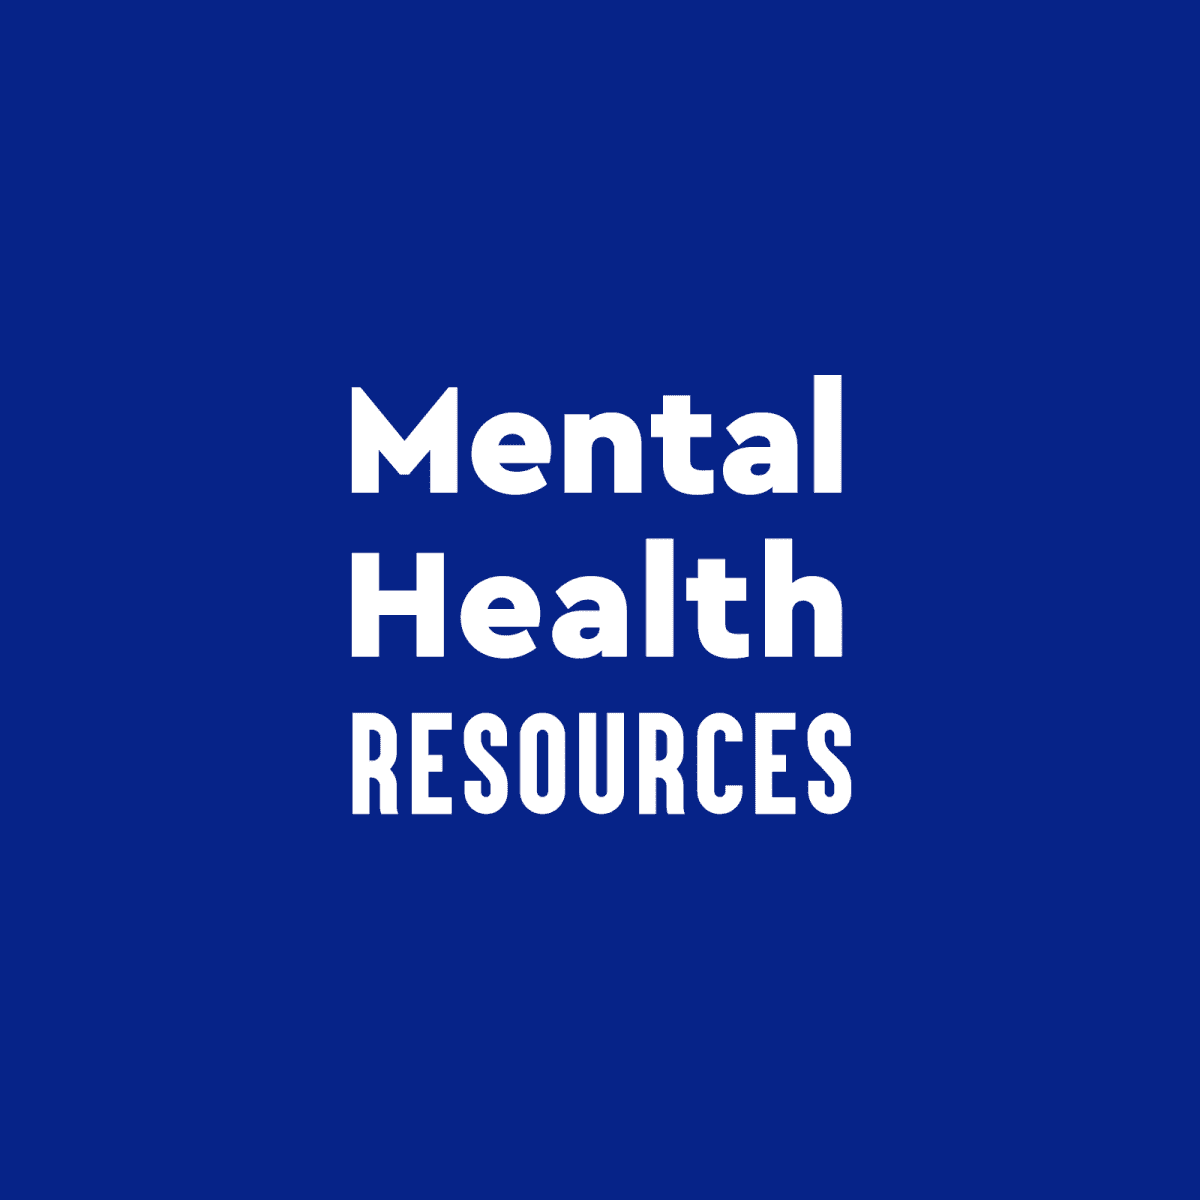 Image representing Mental Health Resources